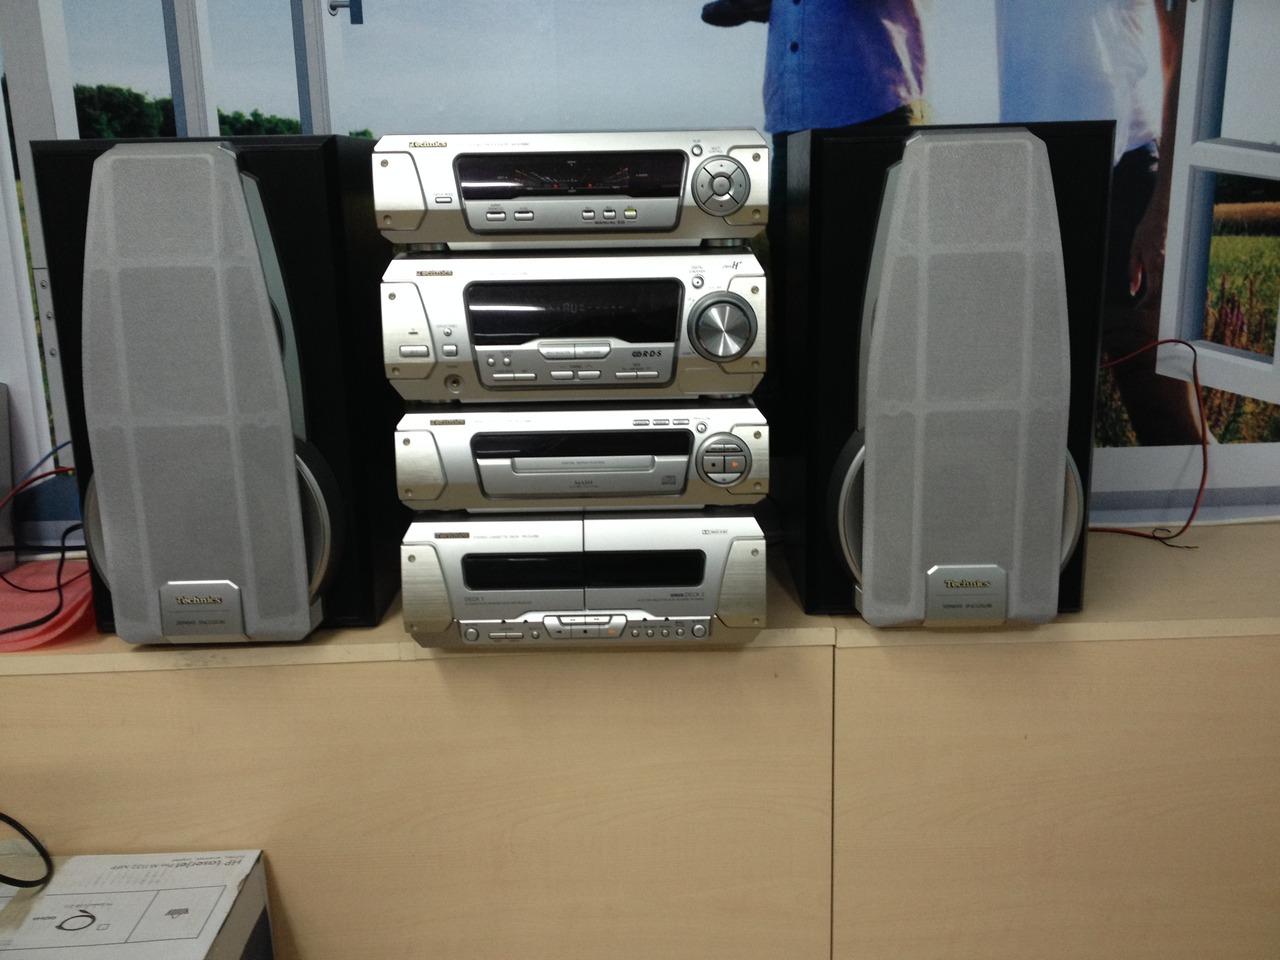 Technics sh-eh580 схема